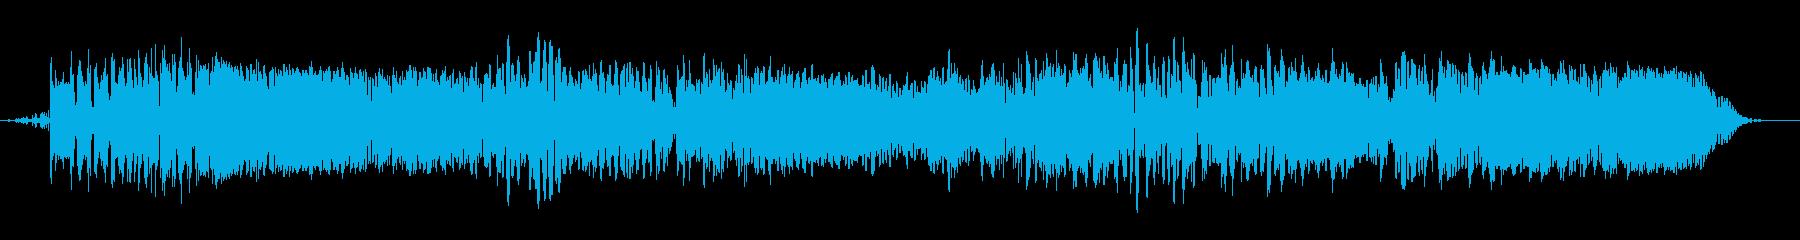 SynthVarious EC03...の再生済みの波形